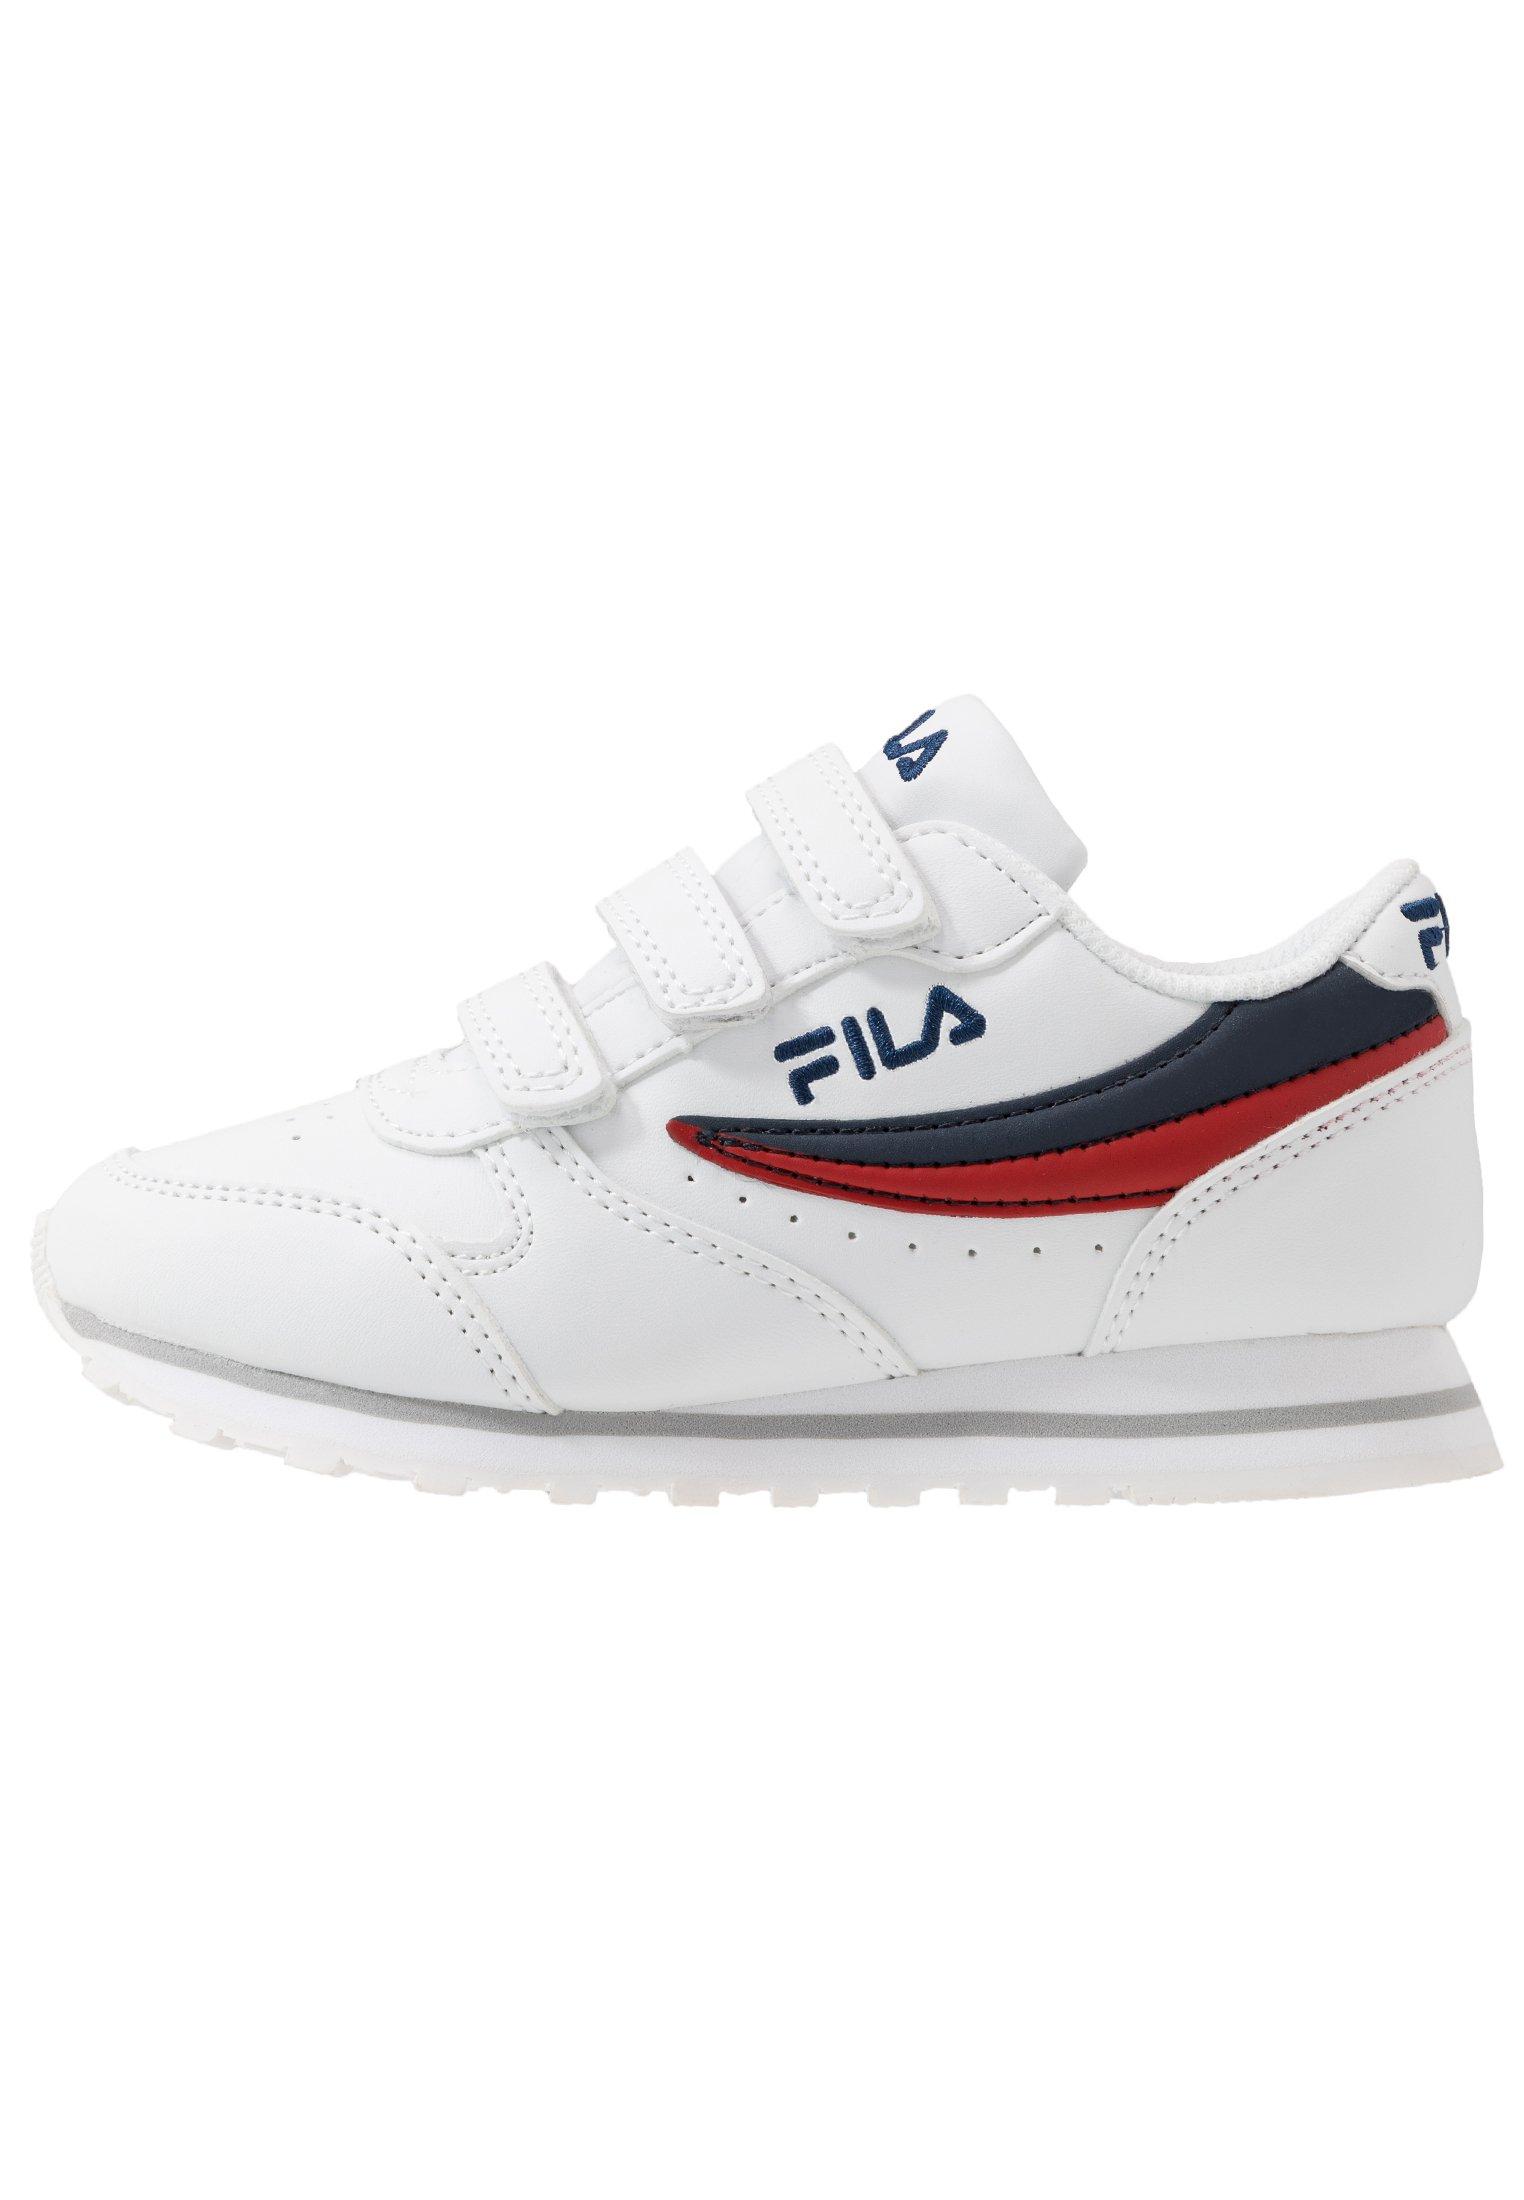 ORBIT KIDS Sneakers laag whitedress blue